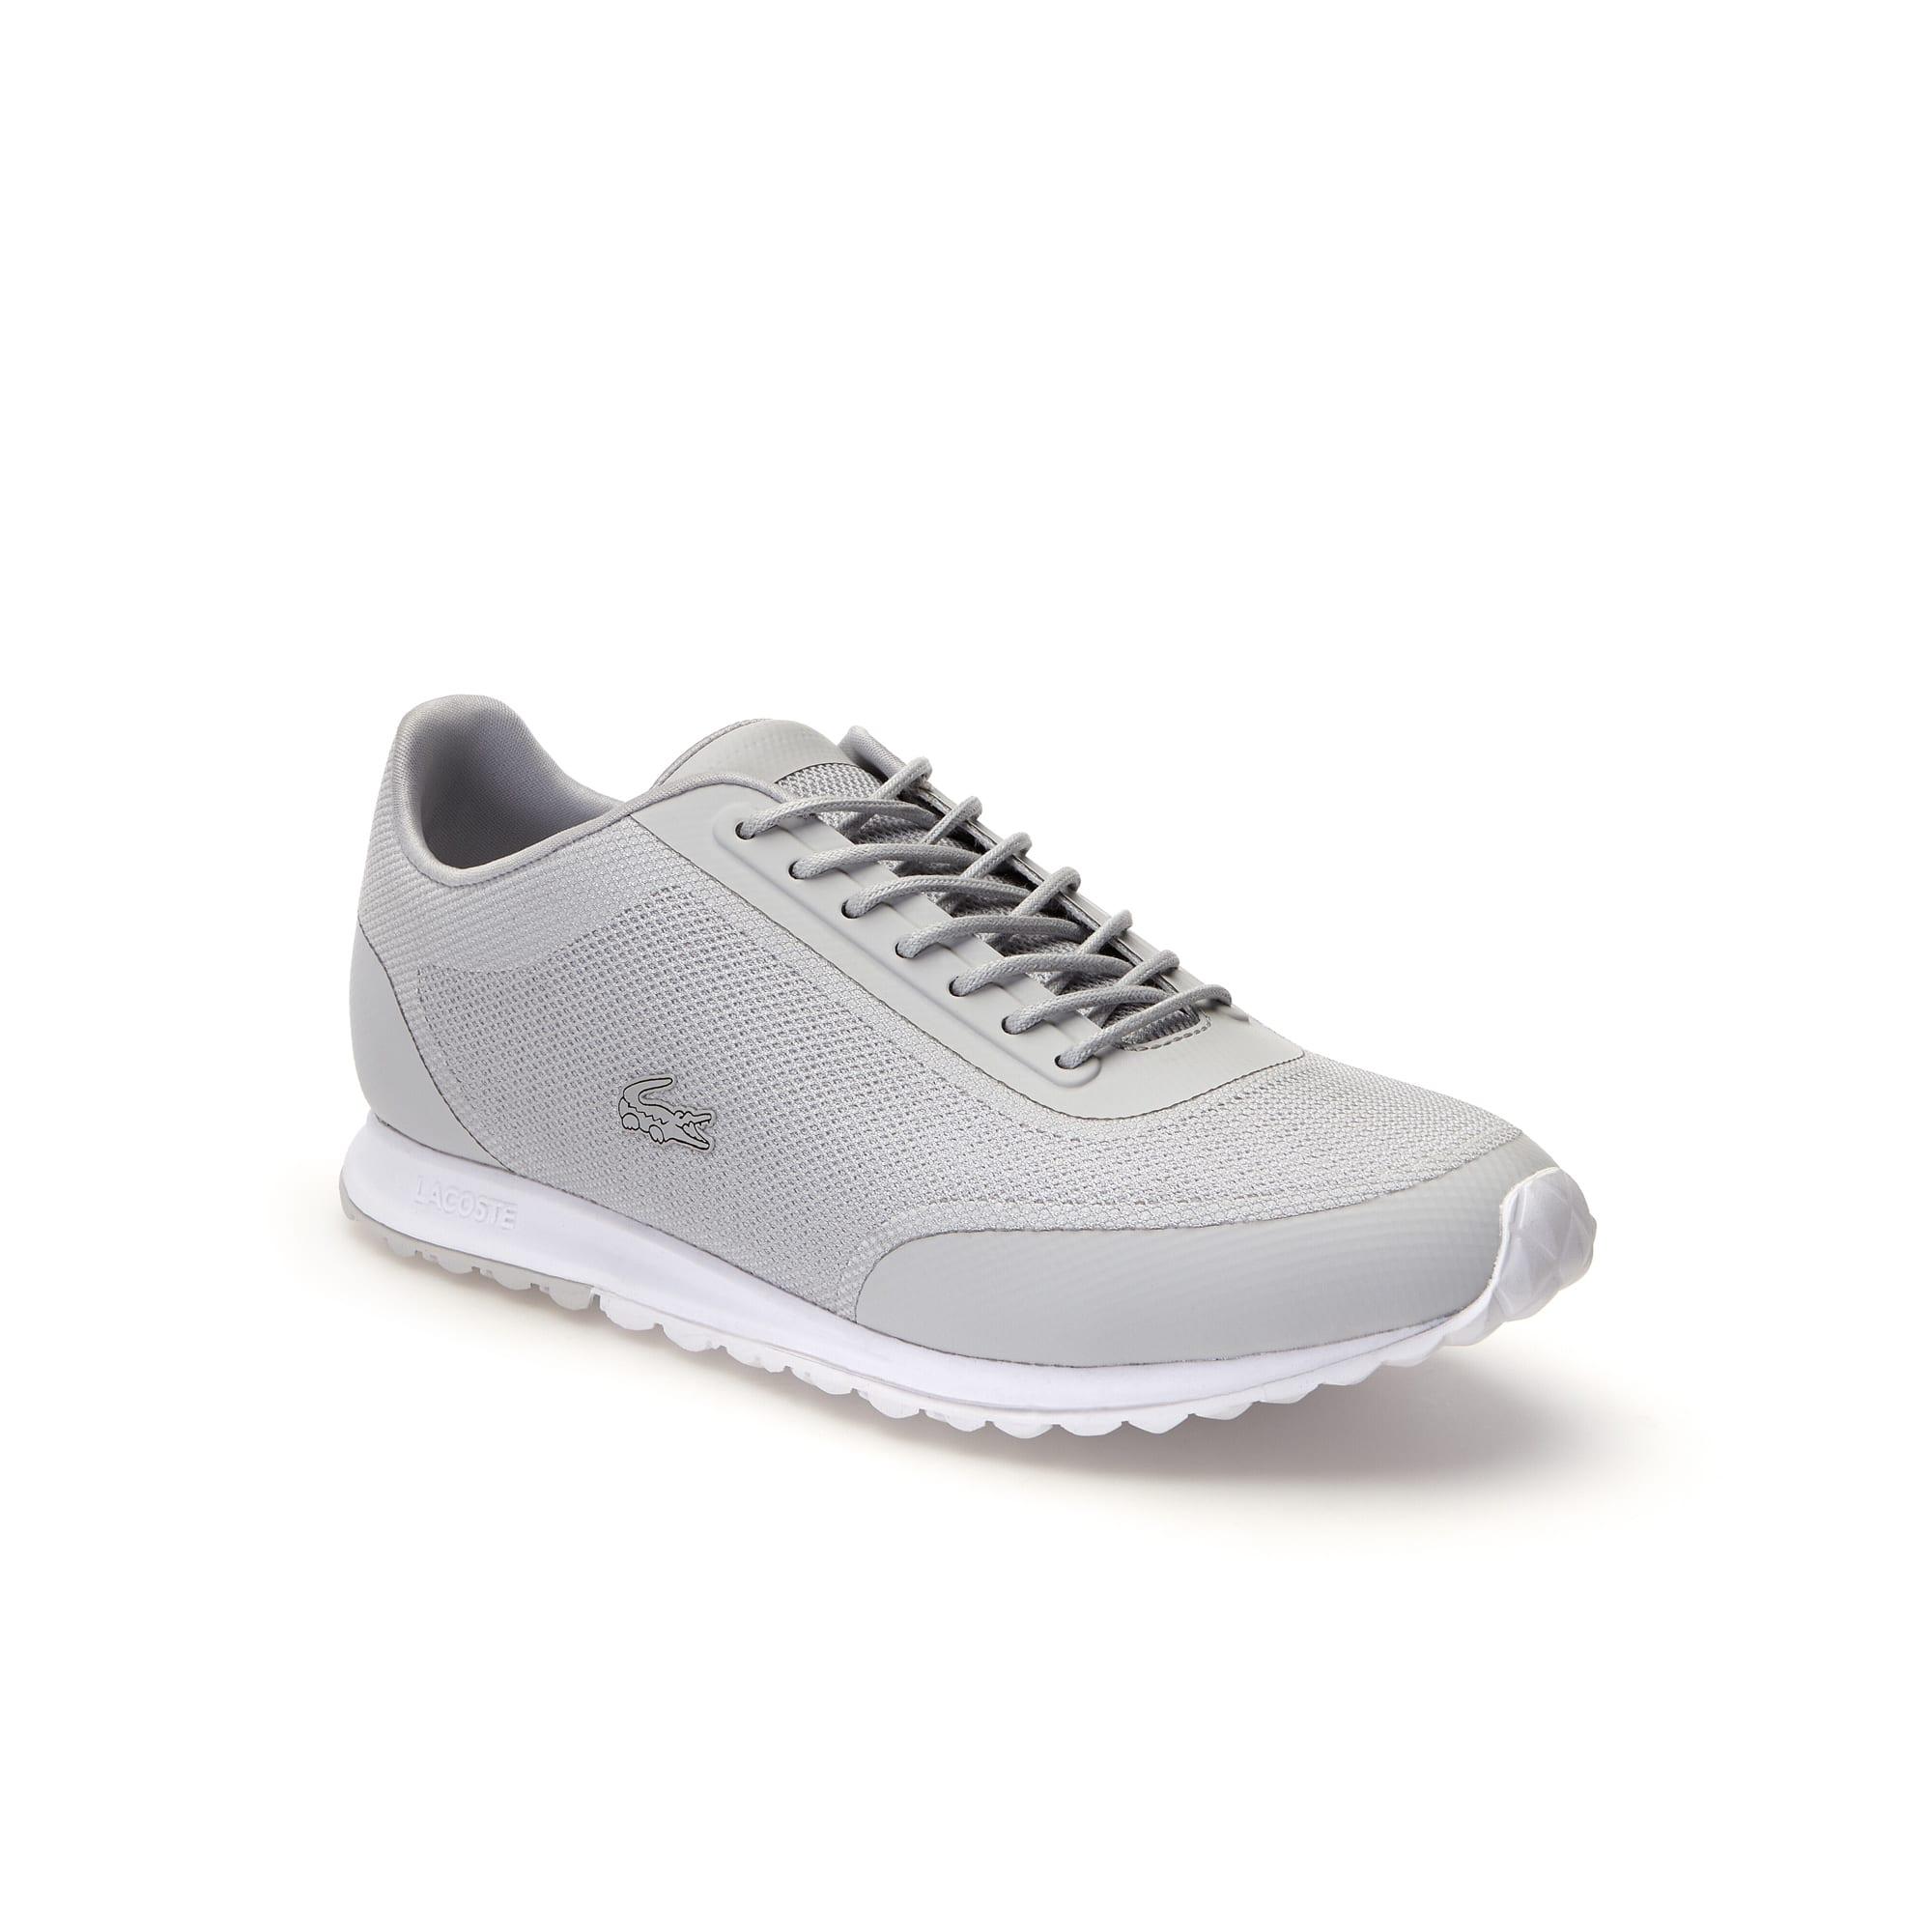 Damen-Sneakers HELAINE RUNNER aus Stoff